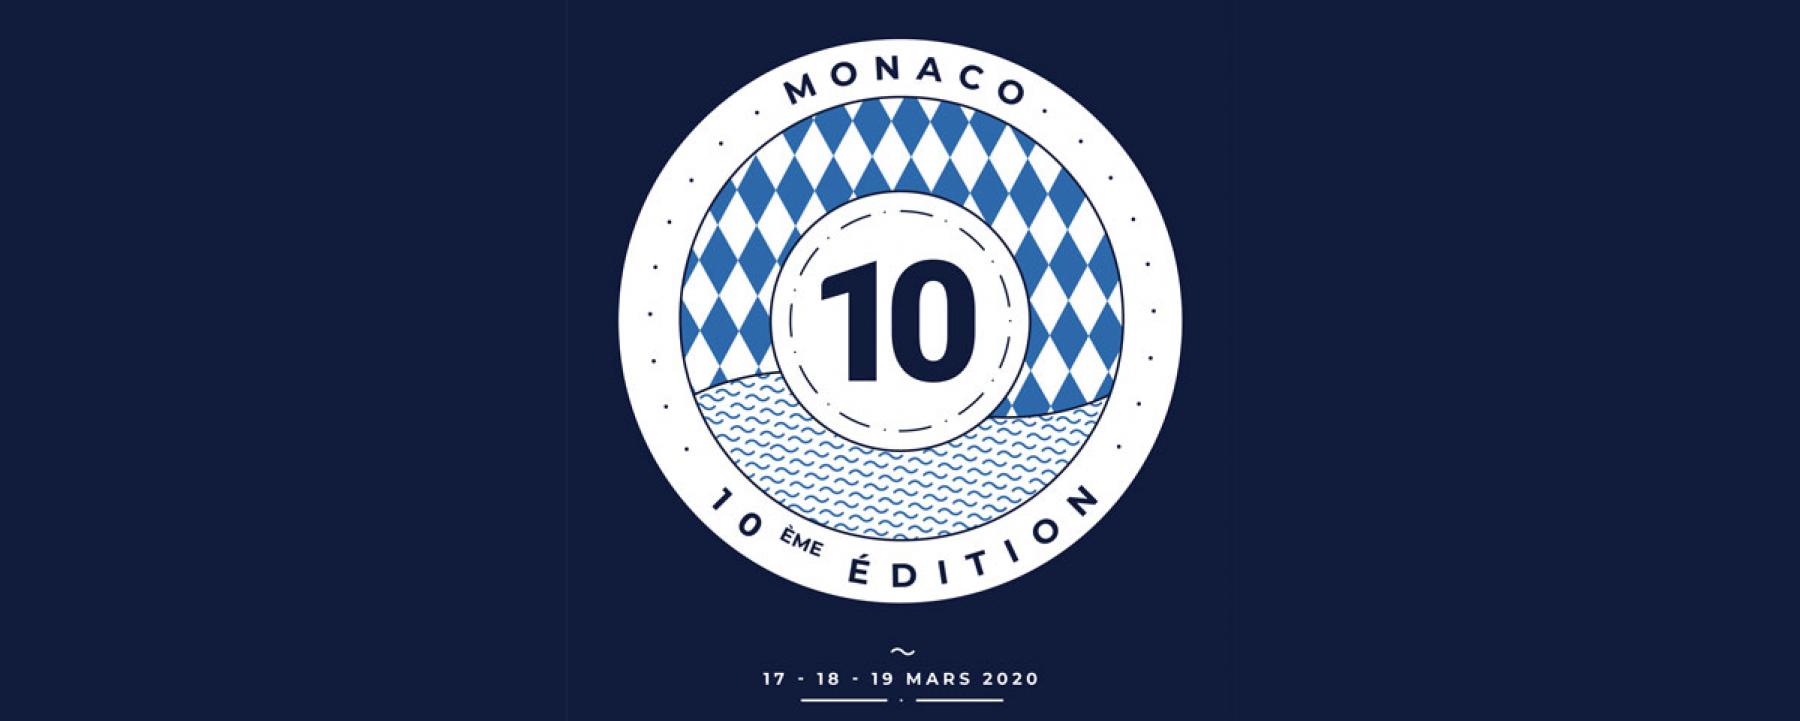 One to One Monaco